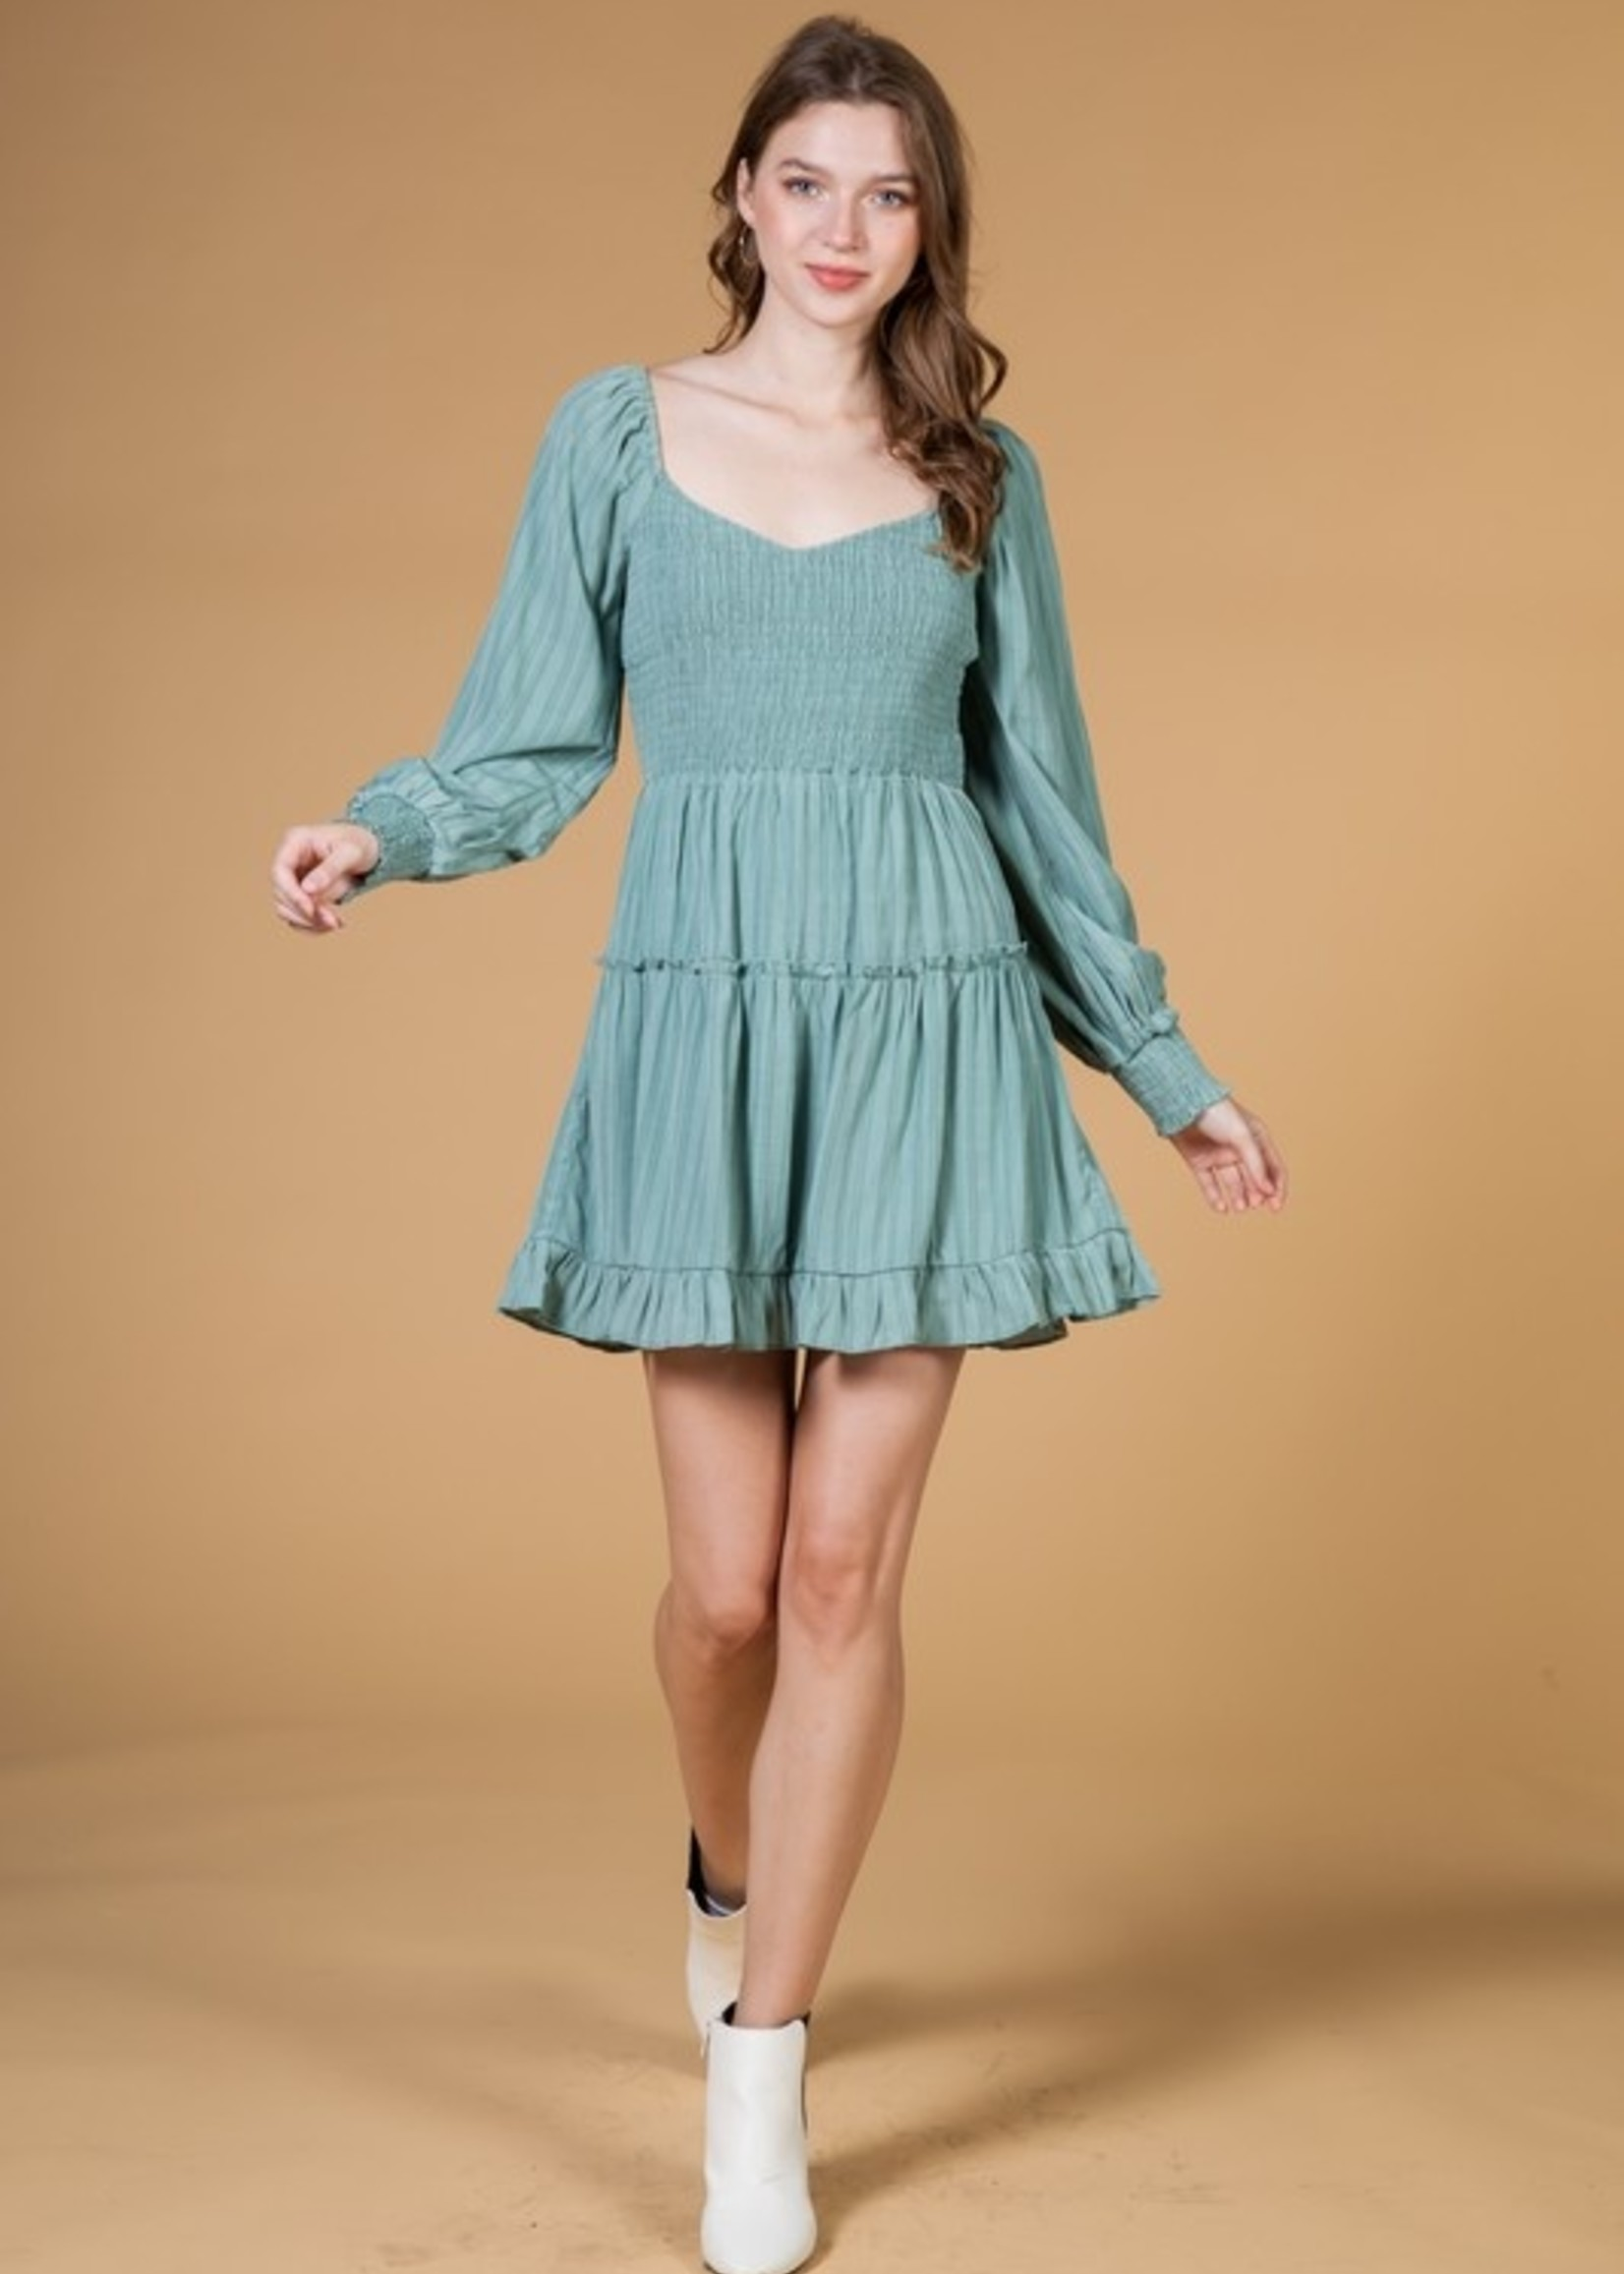 Smocked and Ruffle Dress - Sage